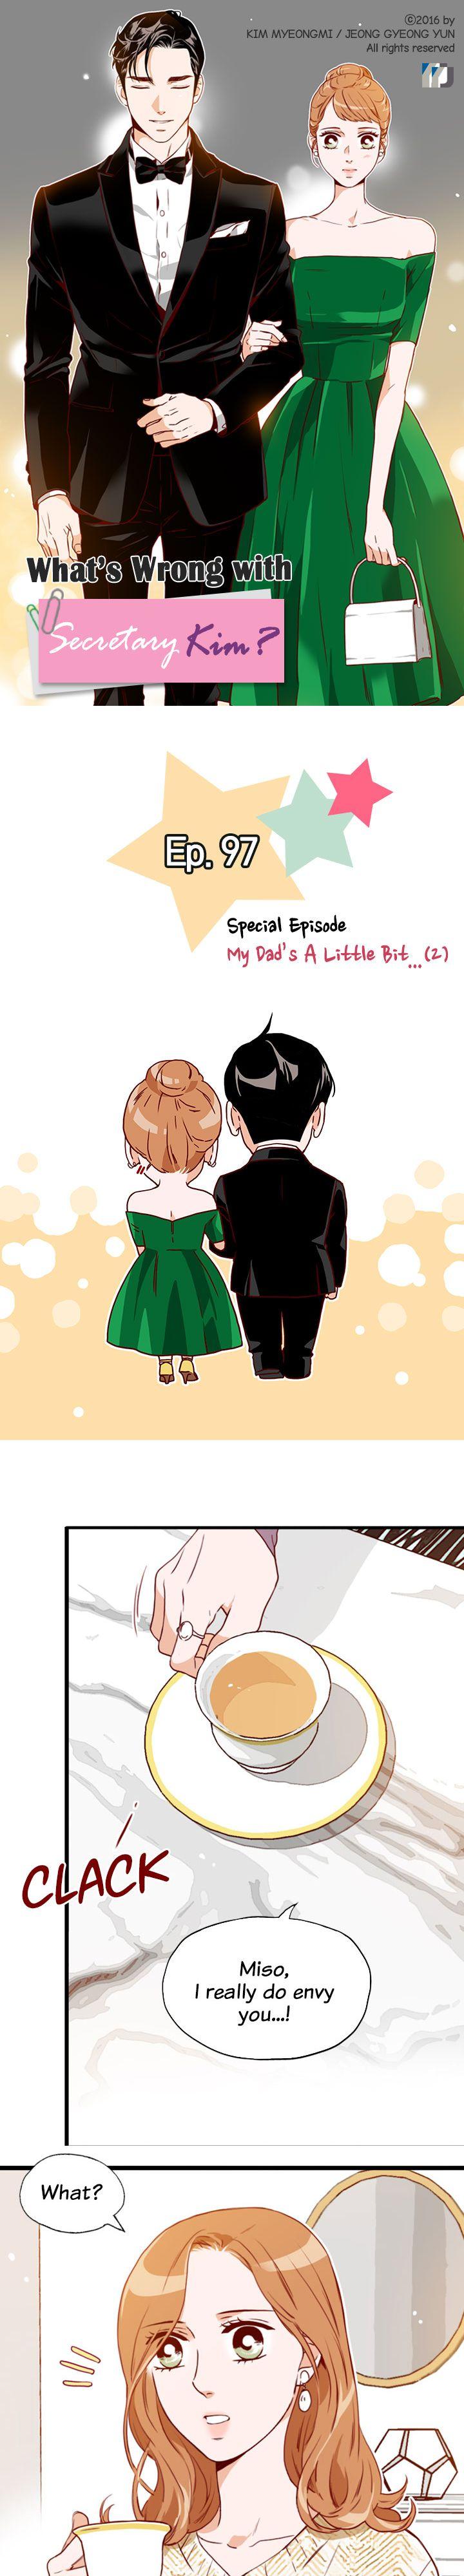 https://manga.mangadogs.com/comics/pic2/15/25807/960754/20fcec0873b39b4df3df34140d77d6e7.jpg Page 1